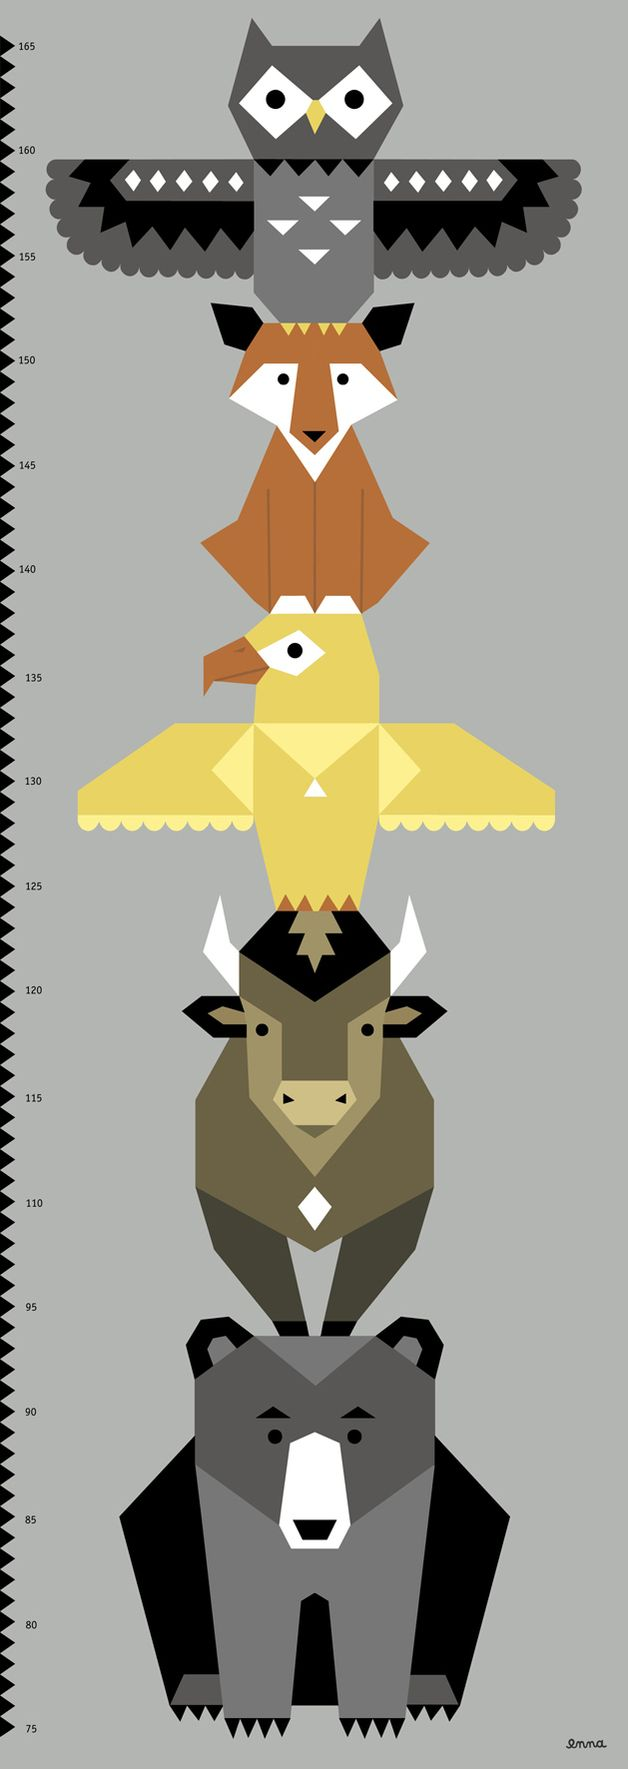 enna Totem Poster Messlatte